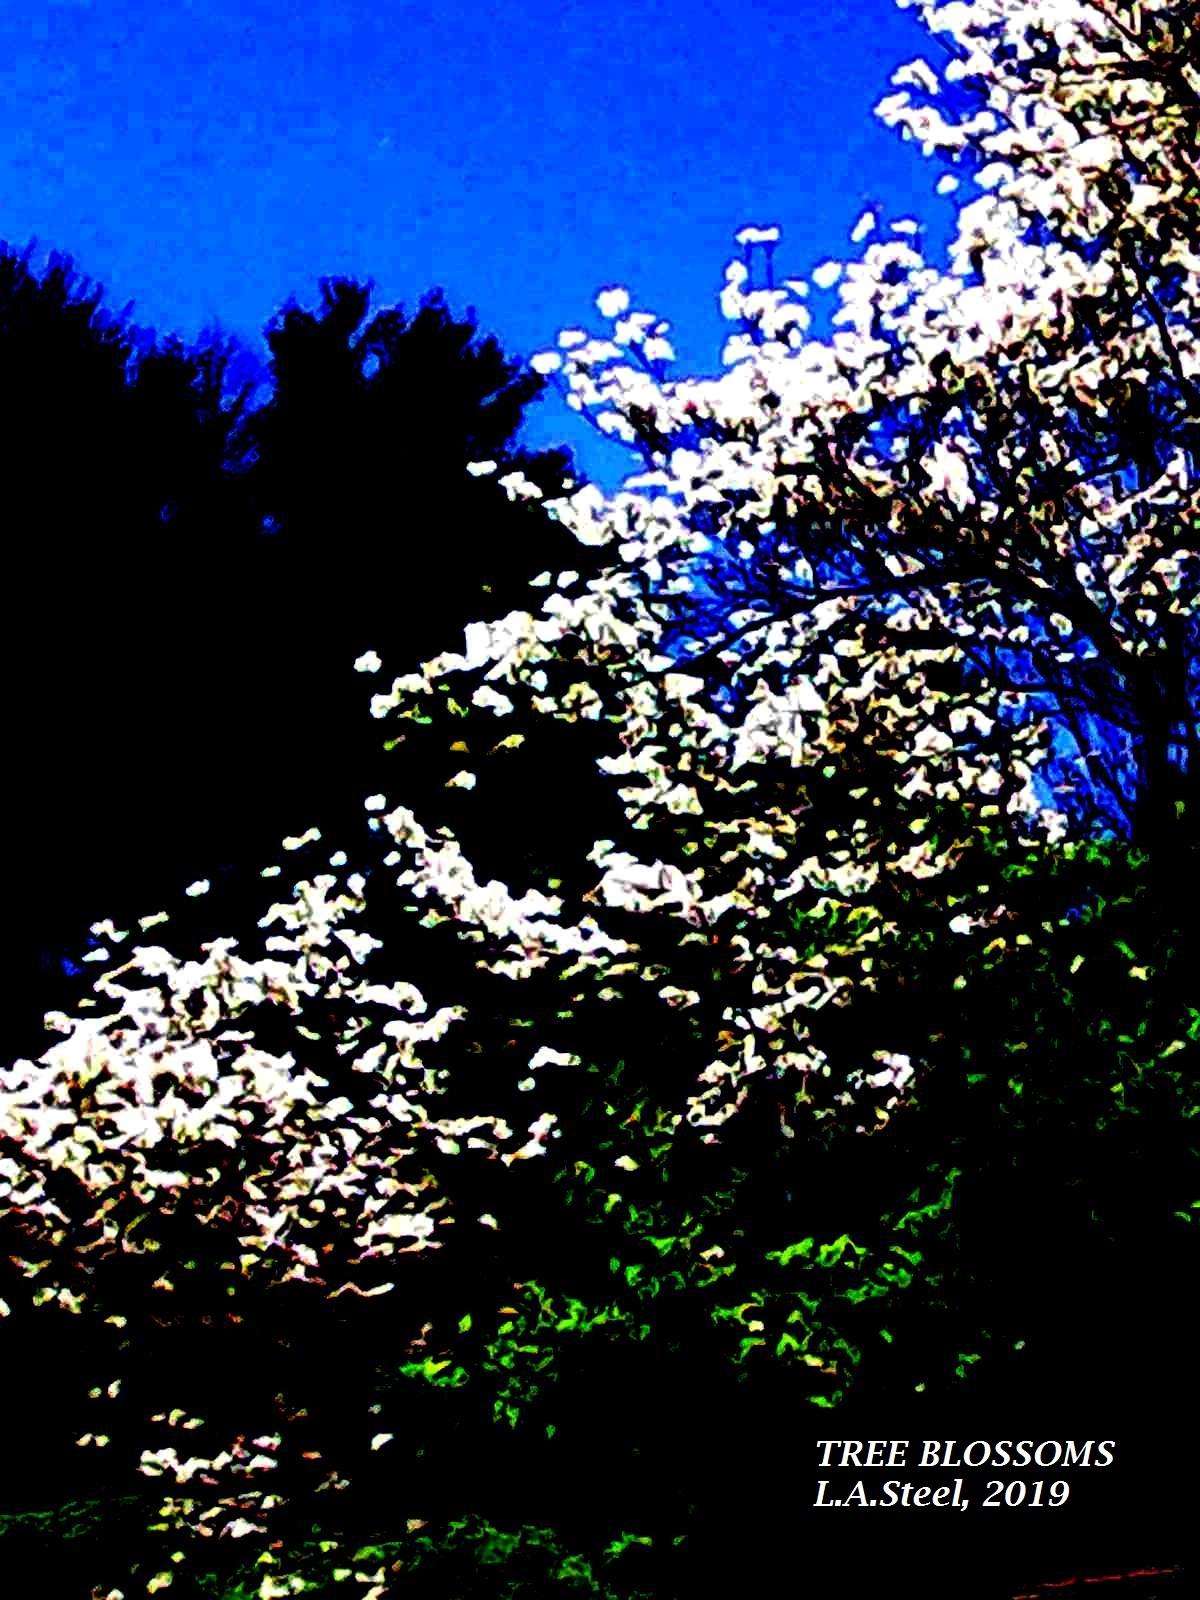 tree blossoms 2 2019